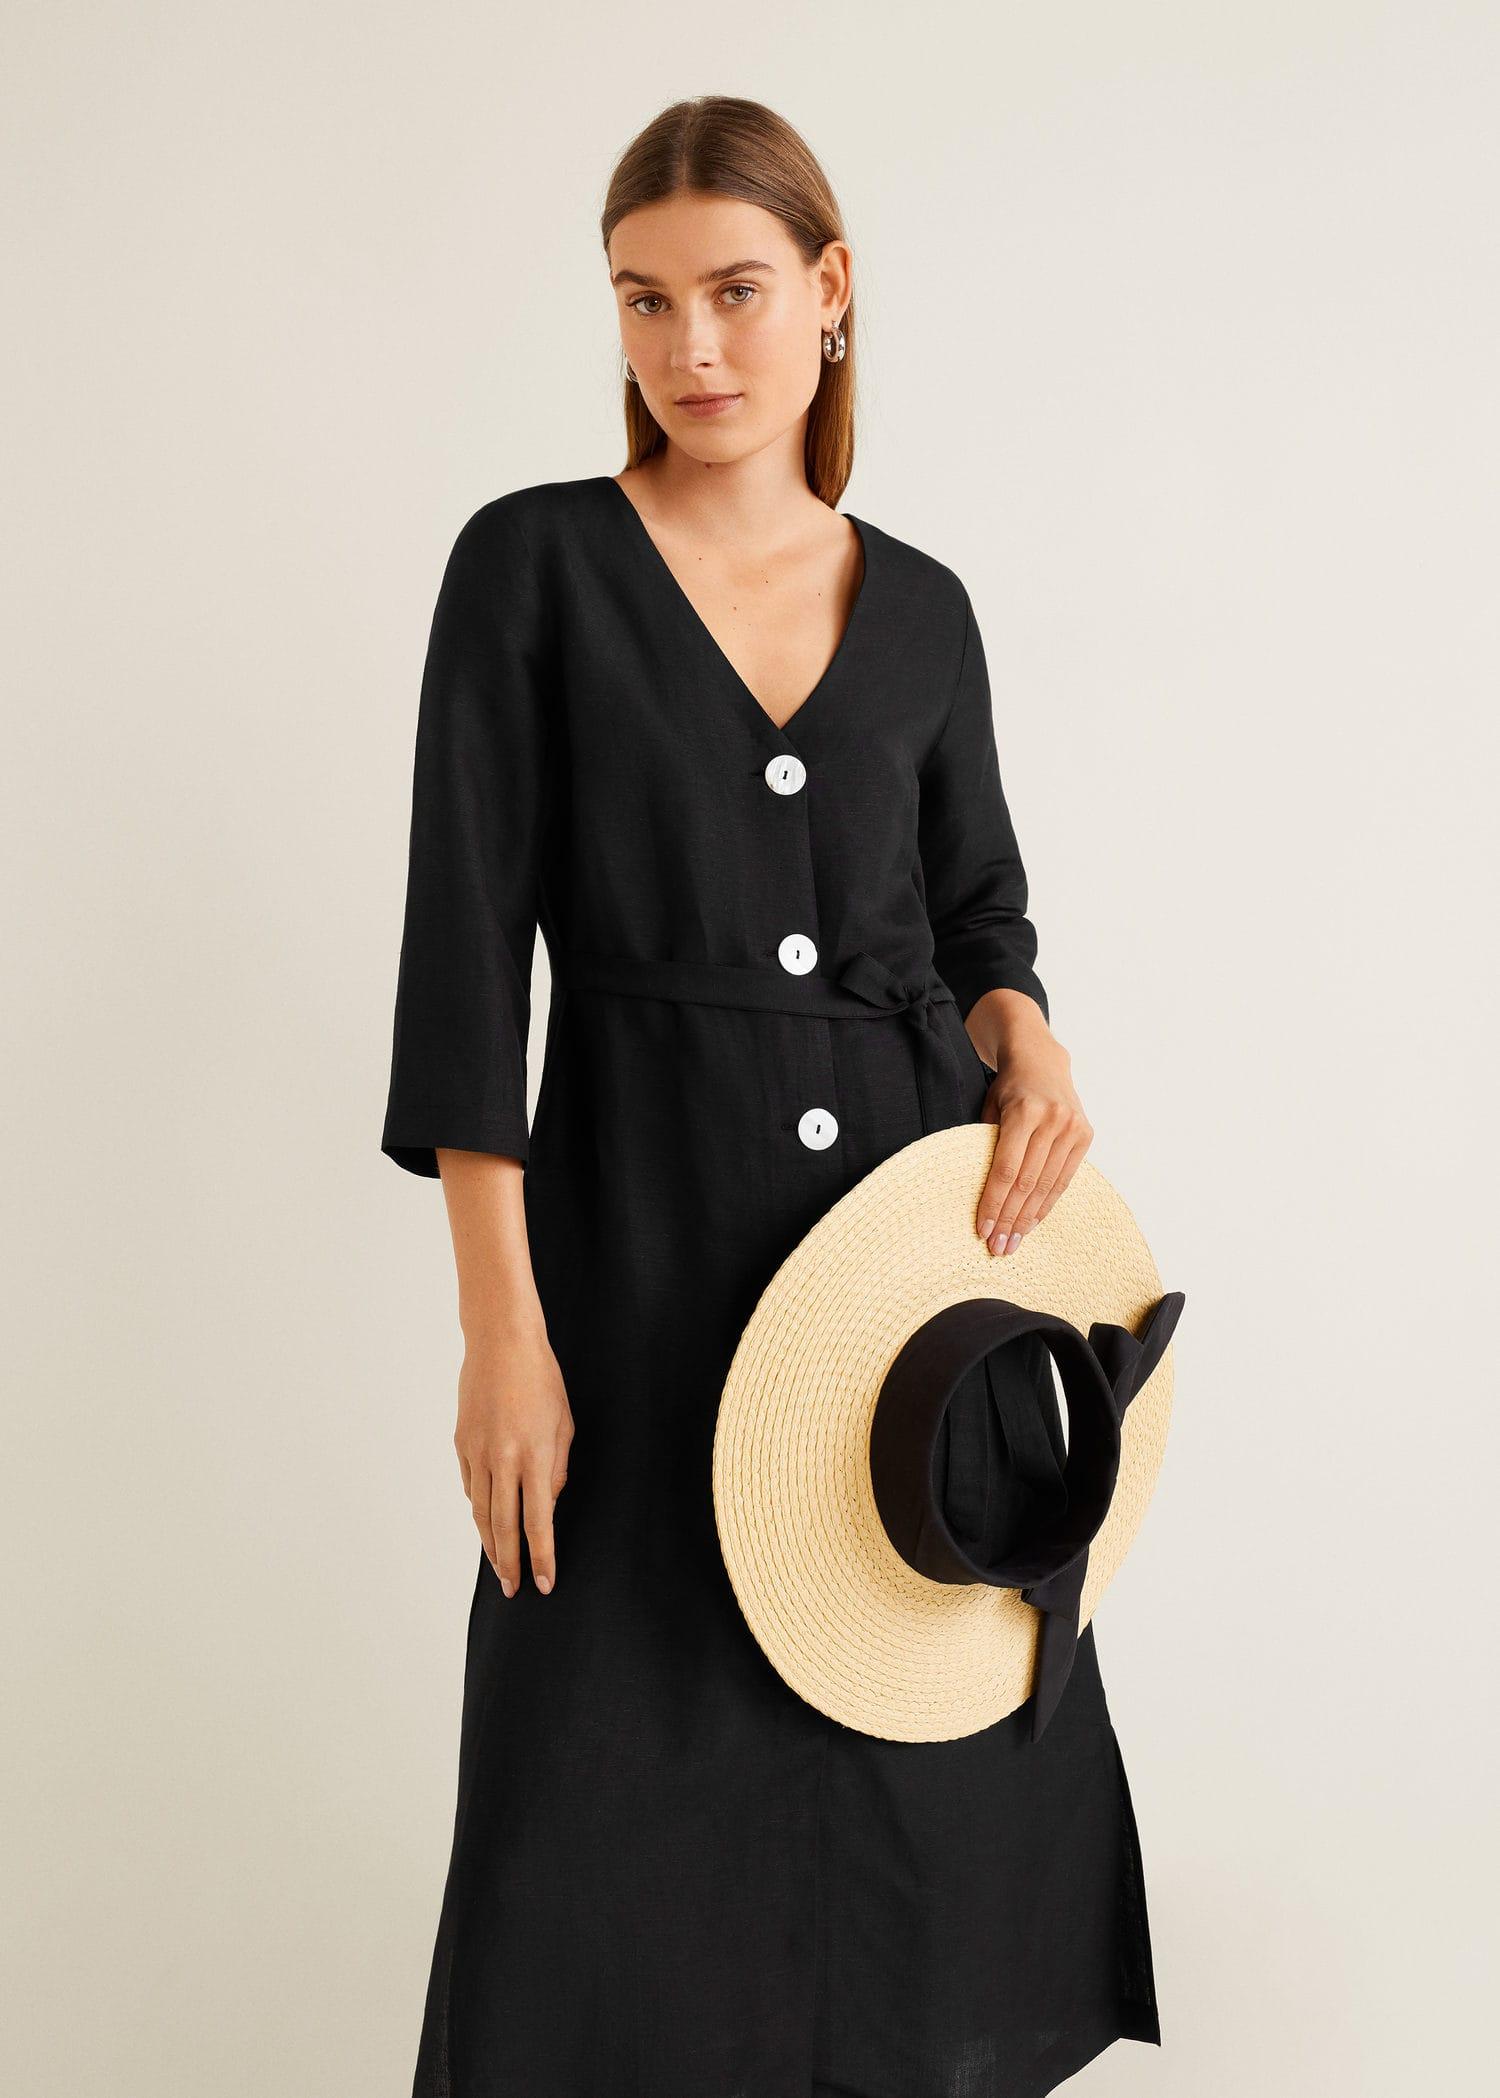 70eaeeb14 Buttoned linen-blend dress - Woman | Mango Saudi Arabia